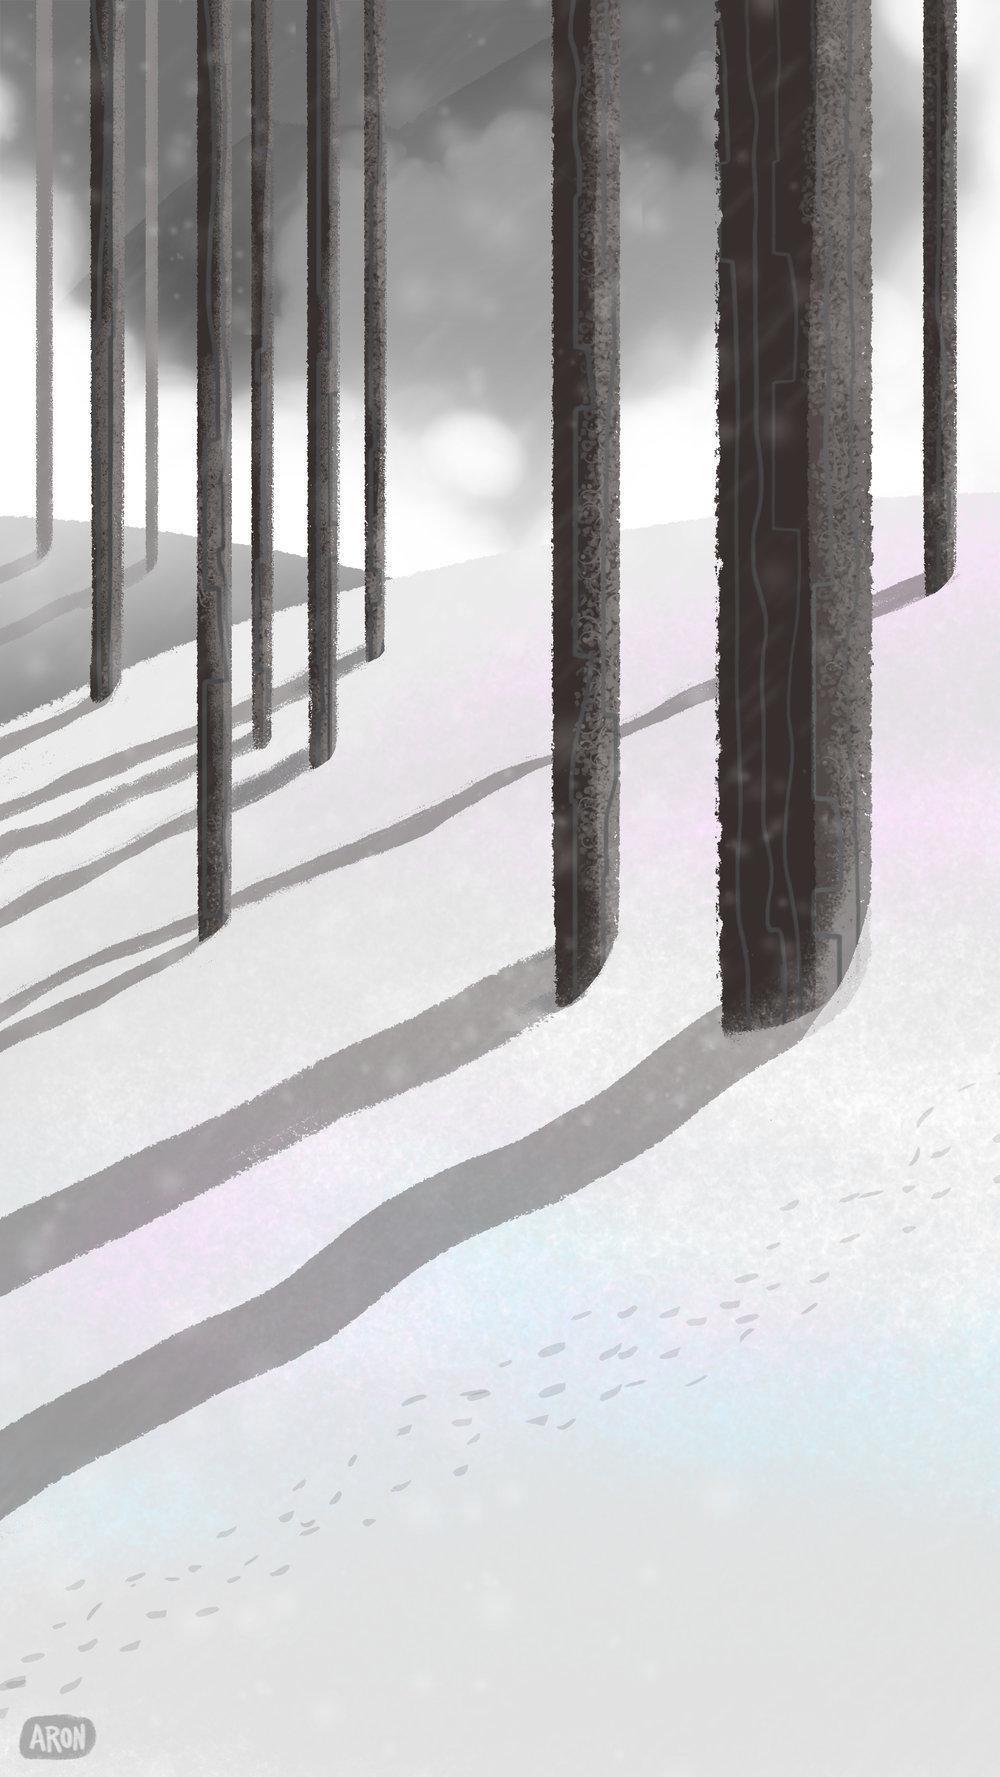 Snowscape.jpg